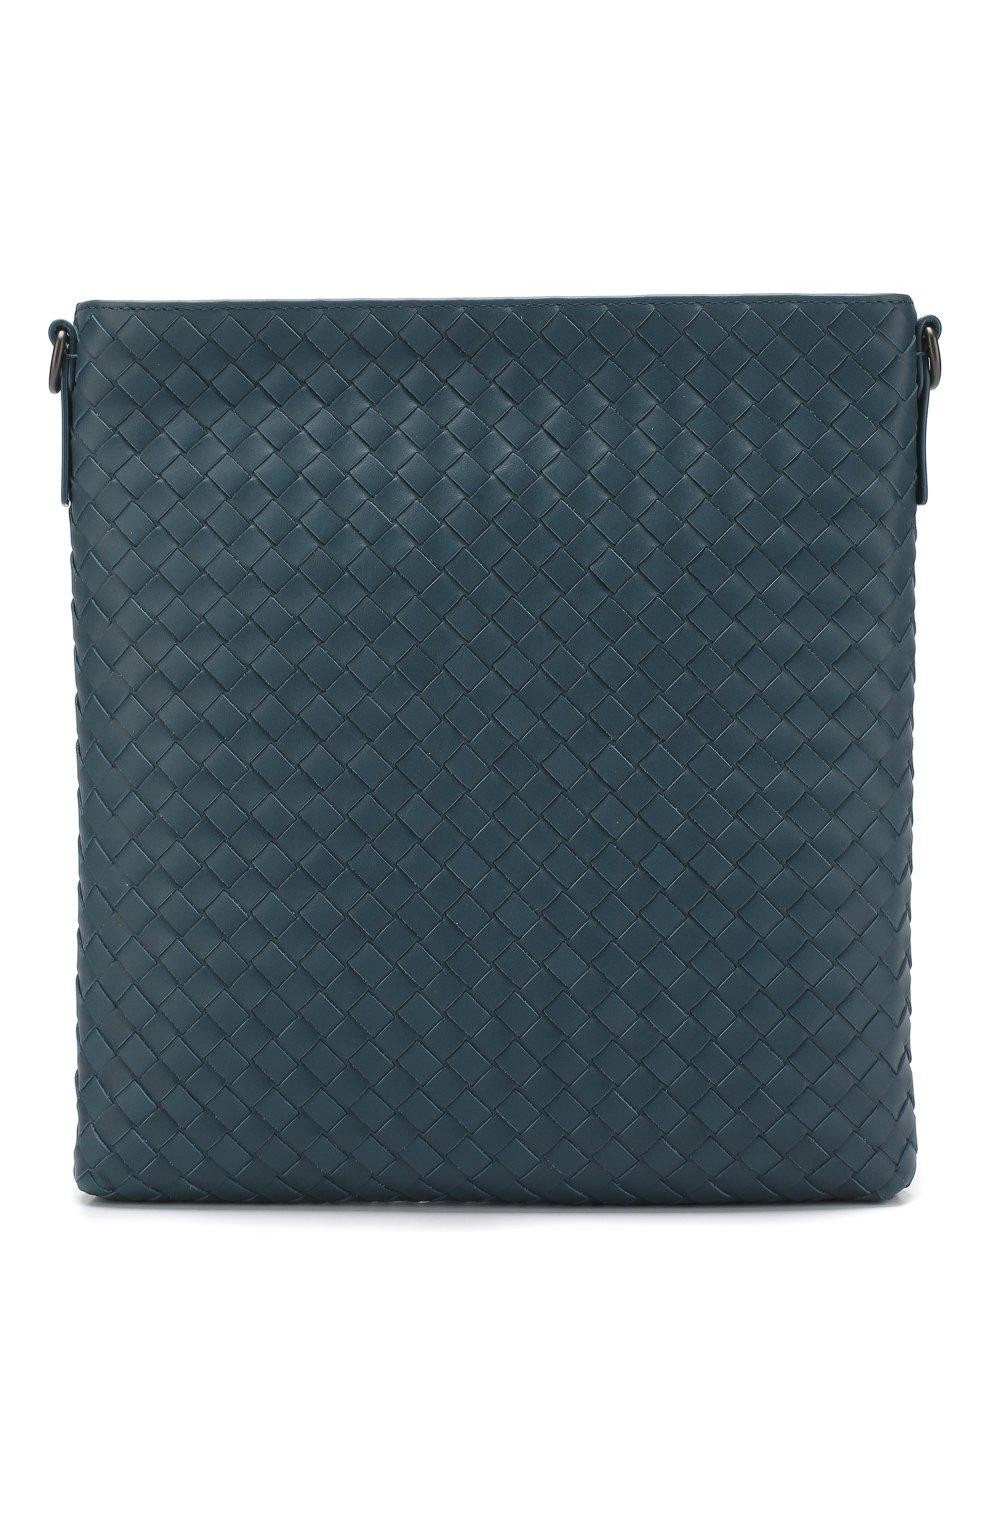 3a9521be08ad Кожаная сумка-планшет с плетением intrecciato Bottega Veneta синяя | Фото №1